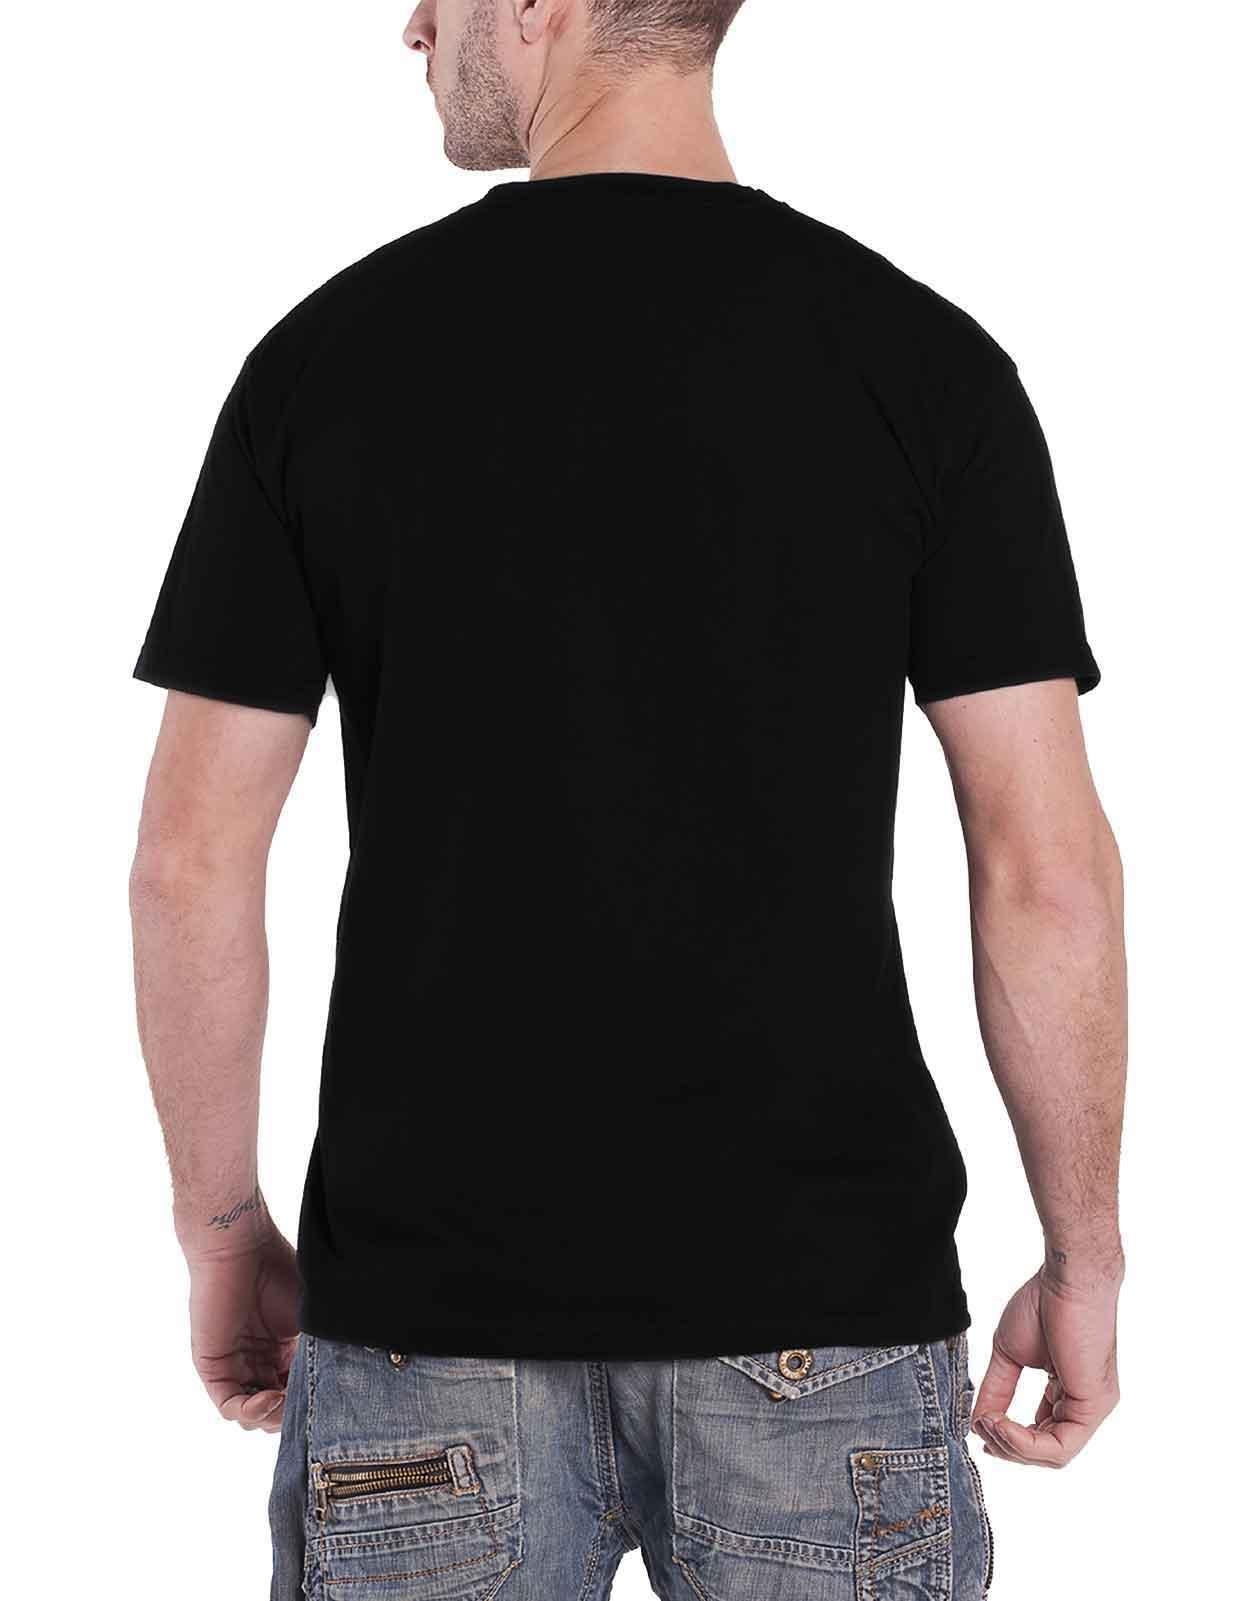 Officiel-Metallica-T-shirt-filaire-justice-for-all-RTL-Band-Logo-Homme-Nouveau miniature 21